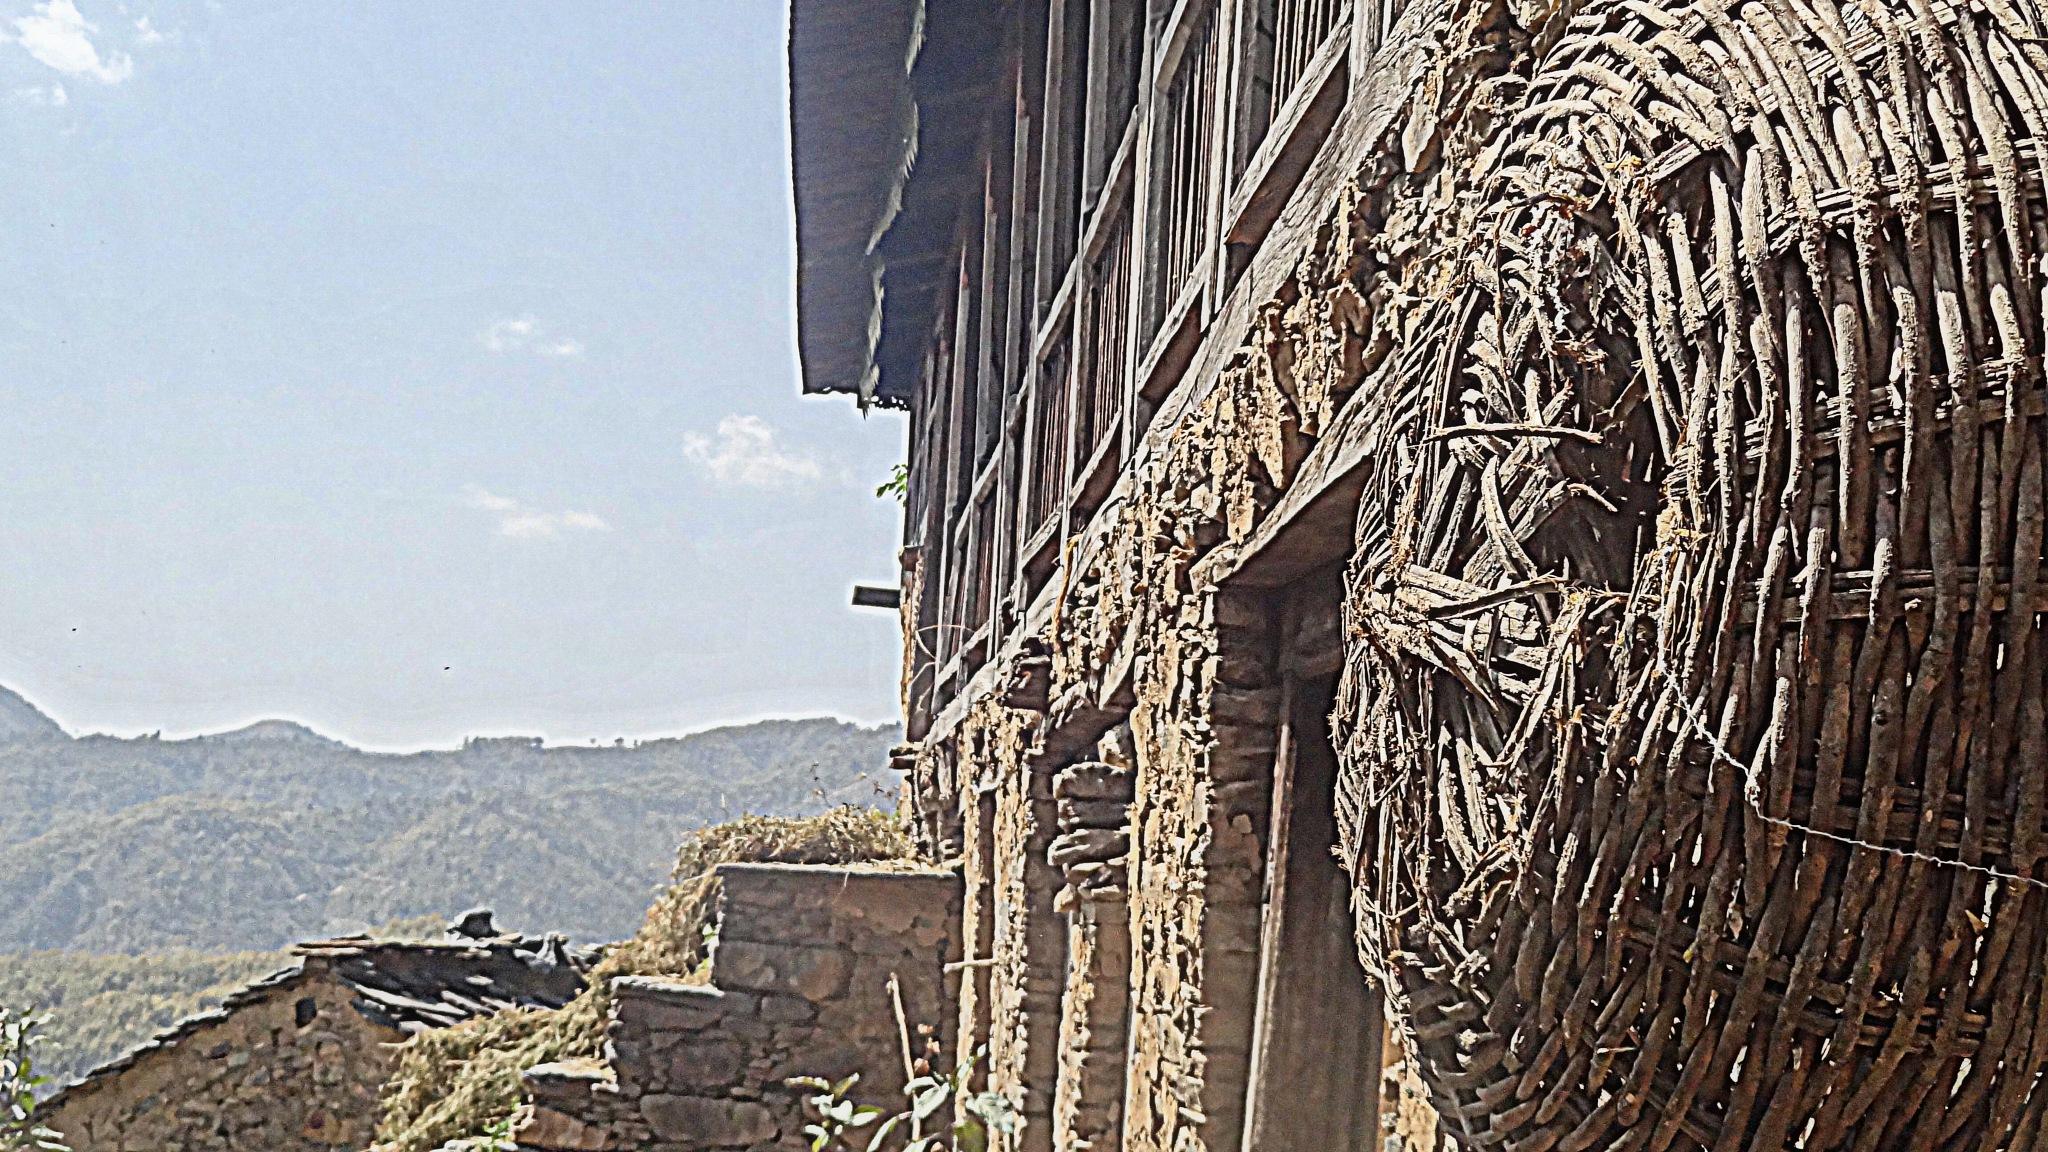 village  by akash dhanai 8888